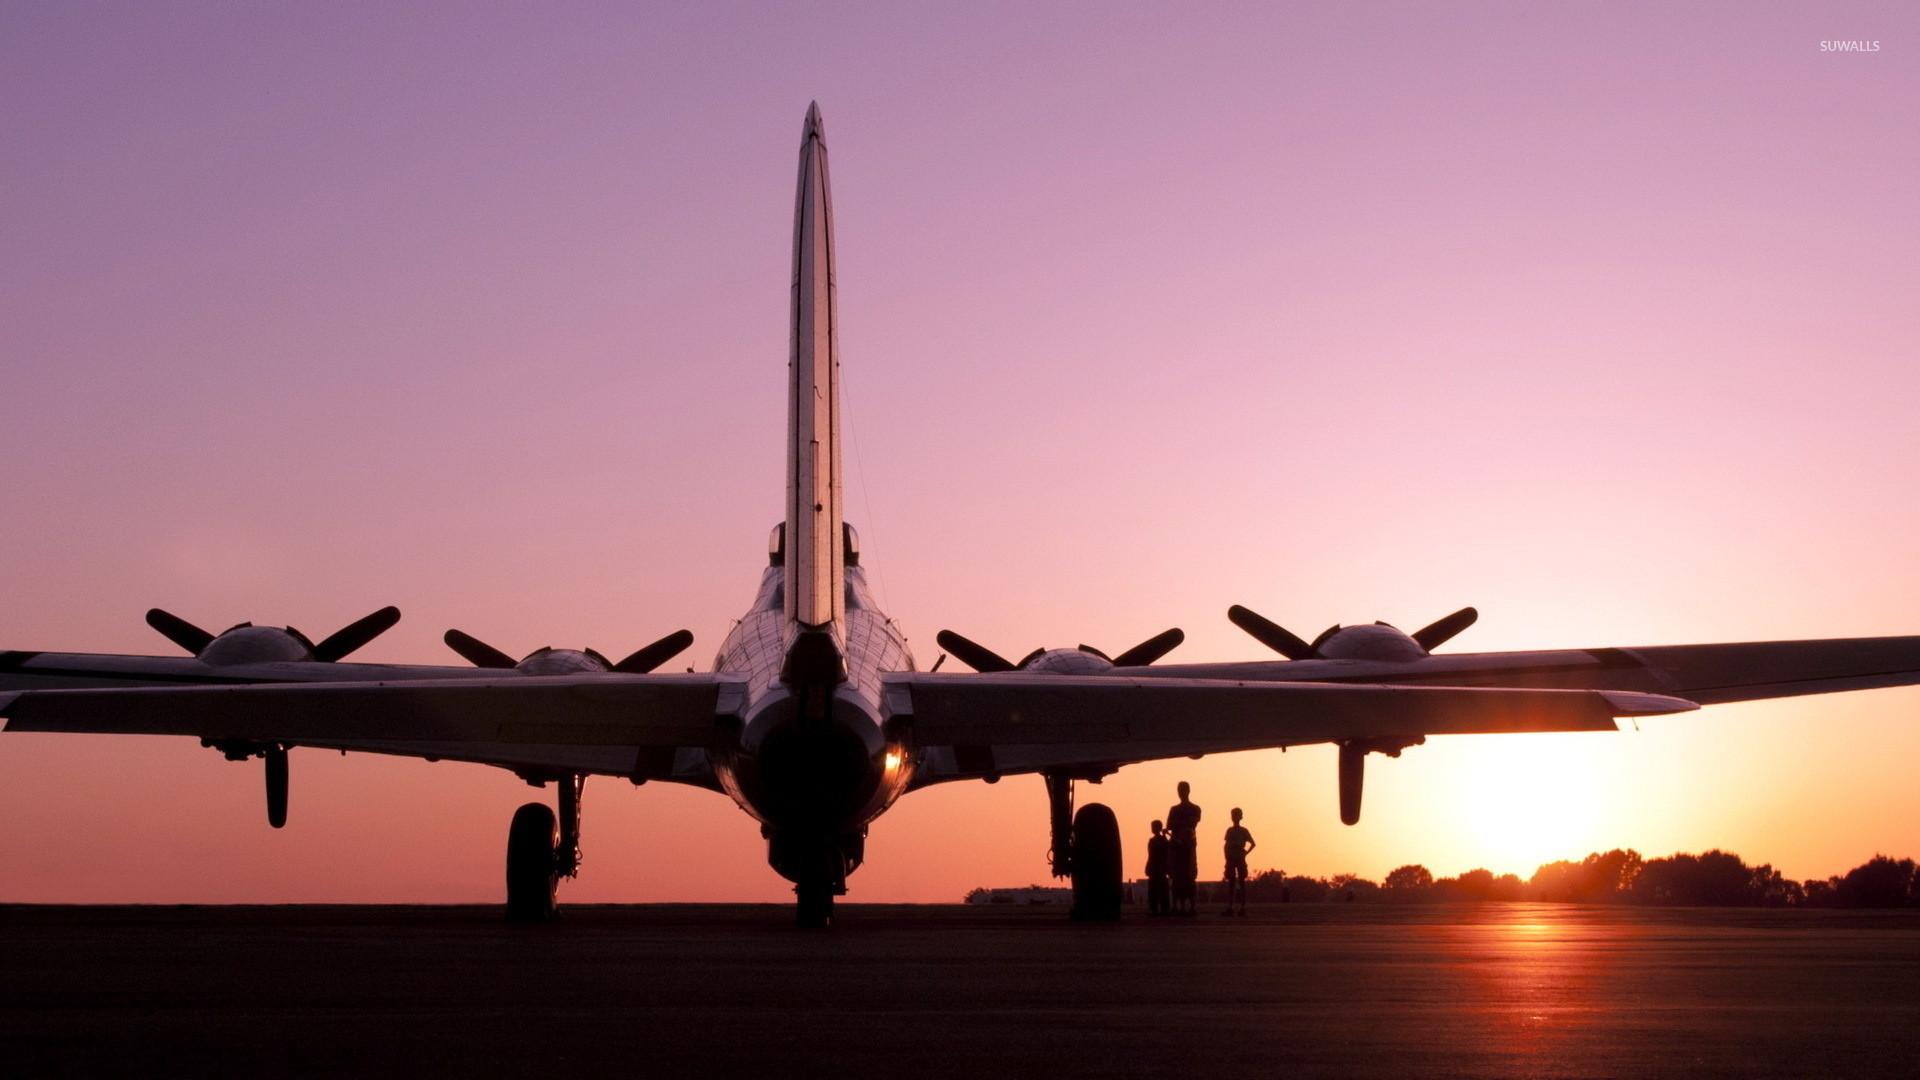 Boeing B-17 Flying Fortress [3] wallpaper jpg